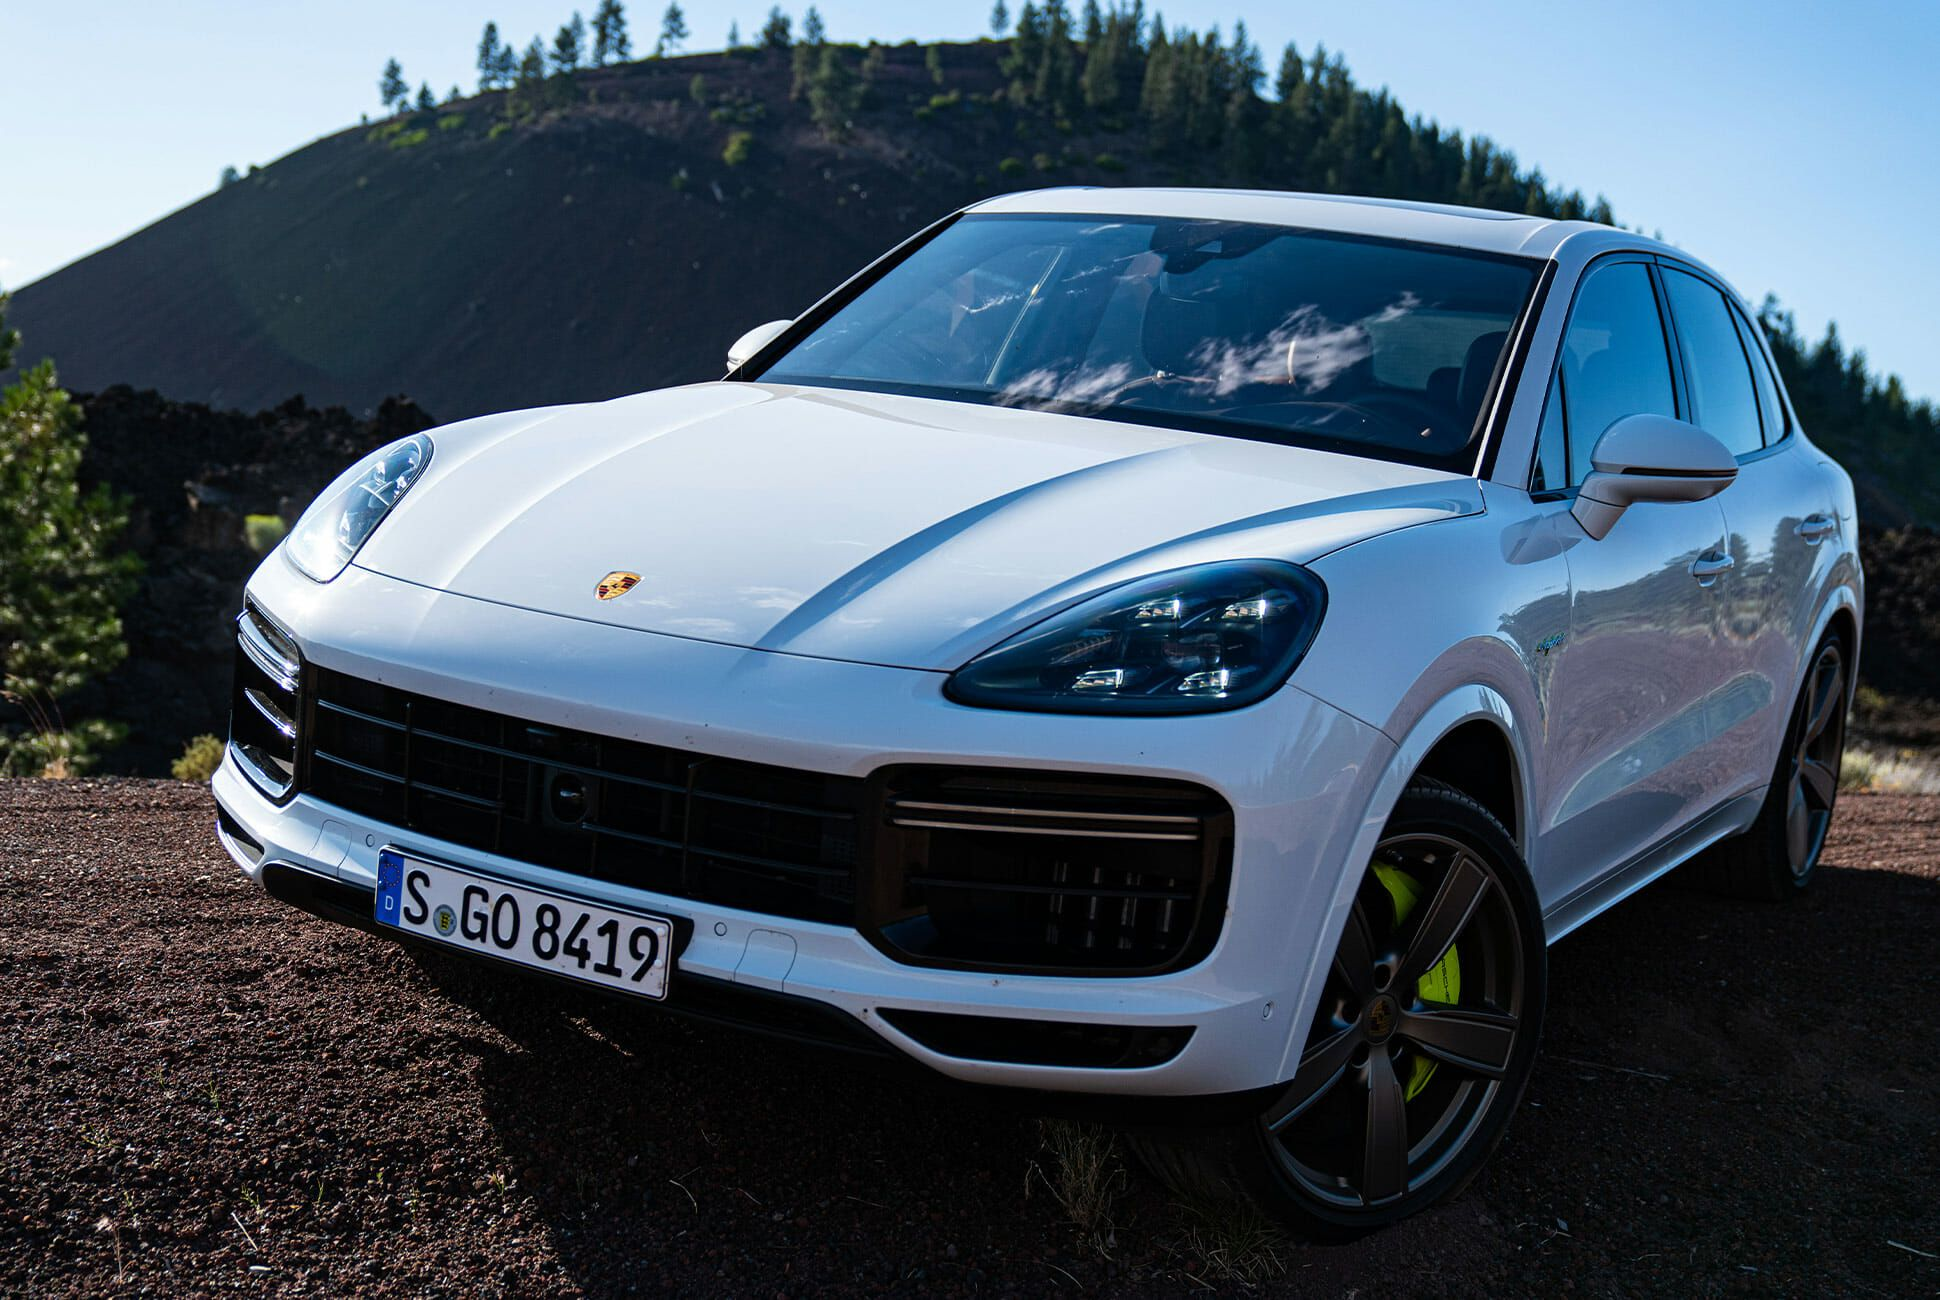 Pair-of-High-Tech-Porsche-Cayenne-Hybrids-gear-patrol-Lava-ambience-6